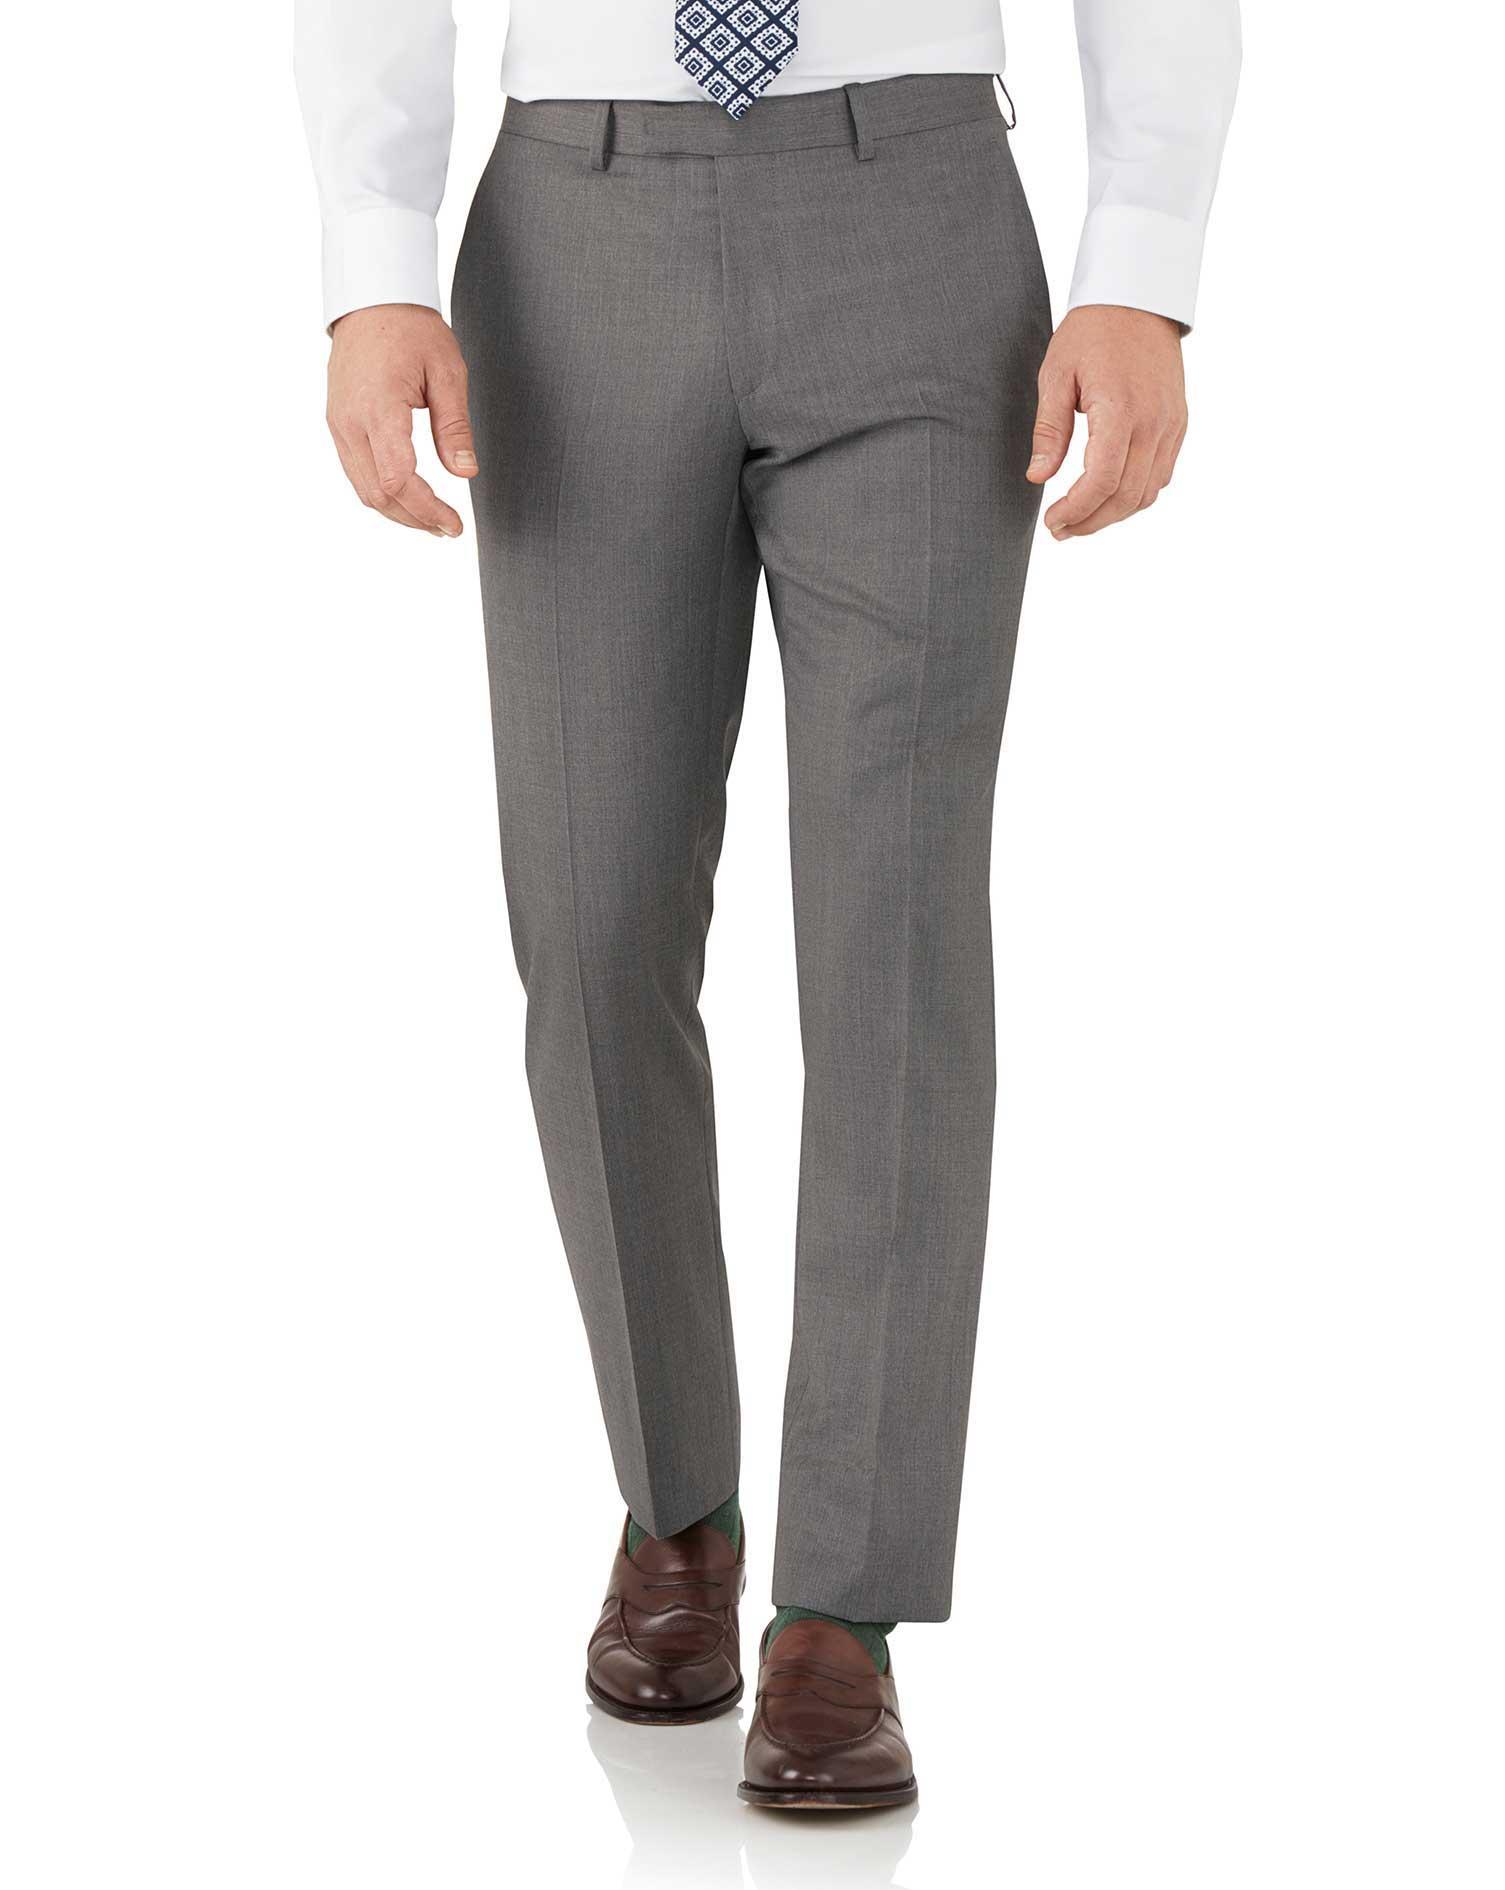 Grey Slim Fit Italian Suit Trousers Size W30 L38 by Charles Tyrwhitt